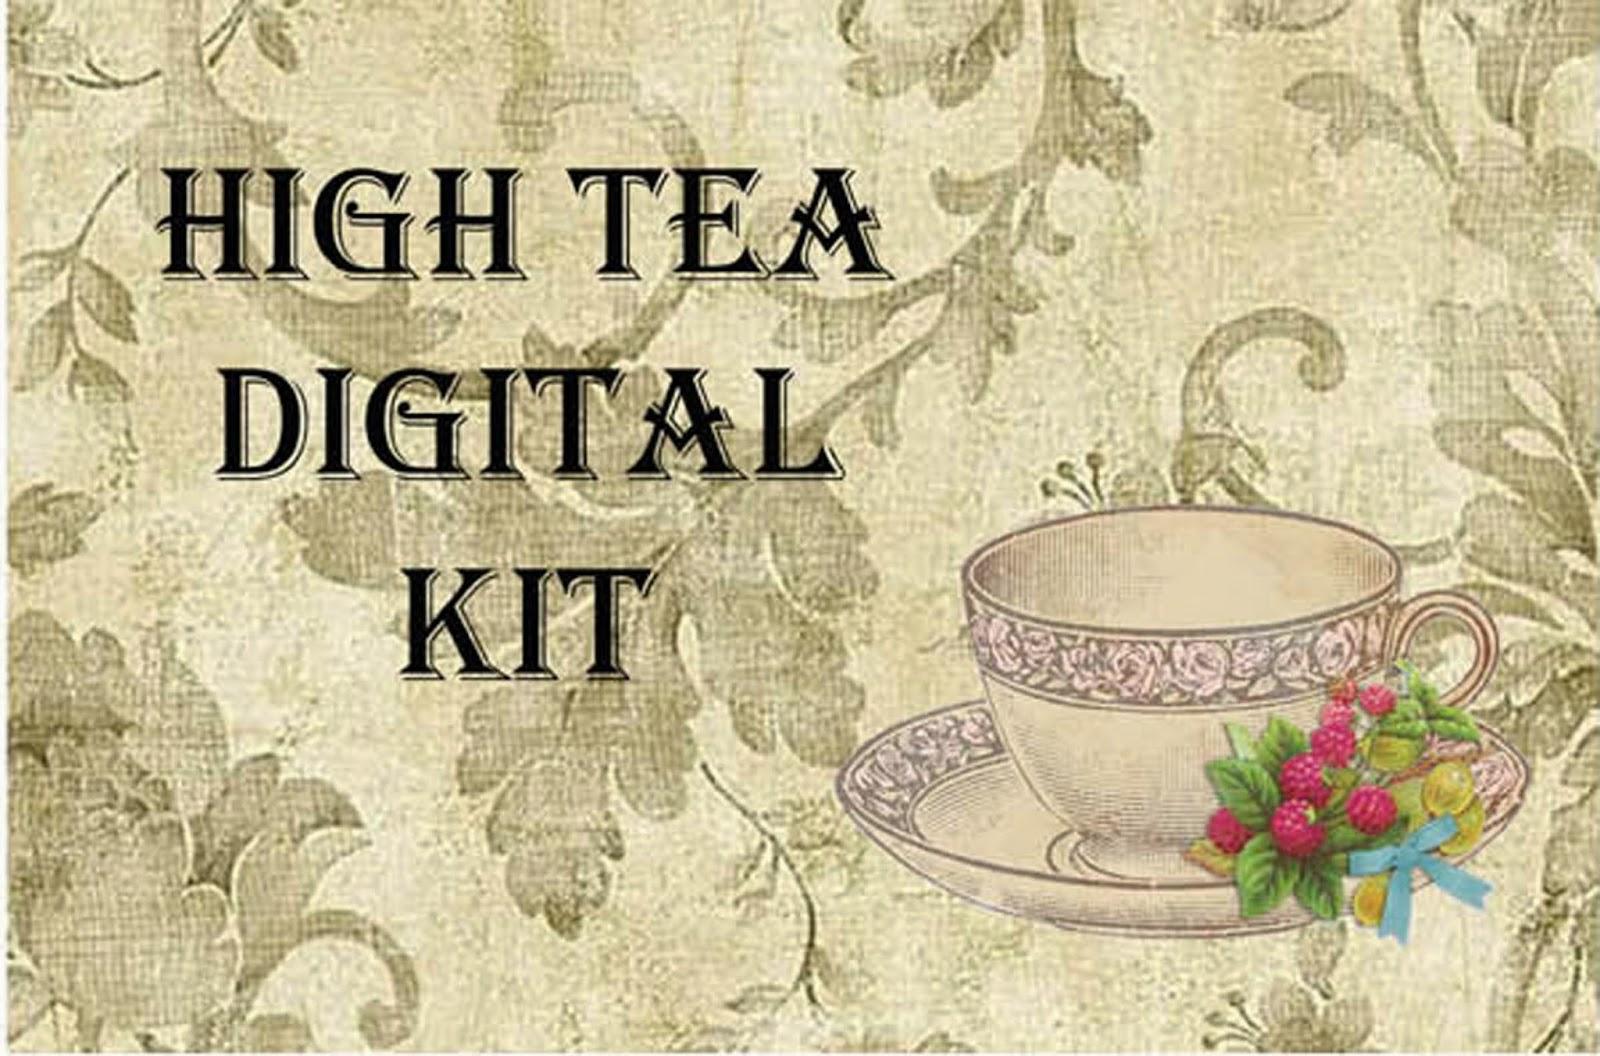 http://4.bp.blogspot.com/-g2o61p3SMd8/VJ7niPO4GzI/AAAAAAAAFWU/g_4QyoiaLGE/s1600/high+tea+cvr.jpg